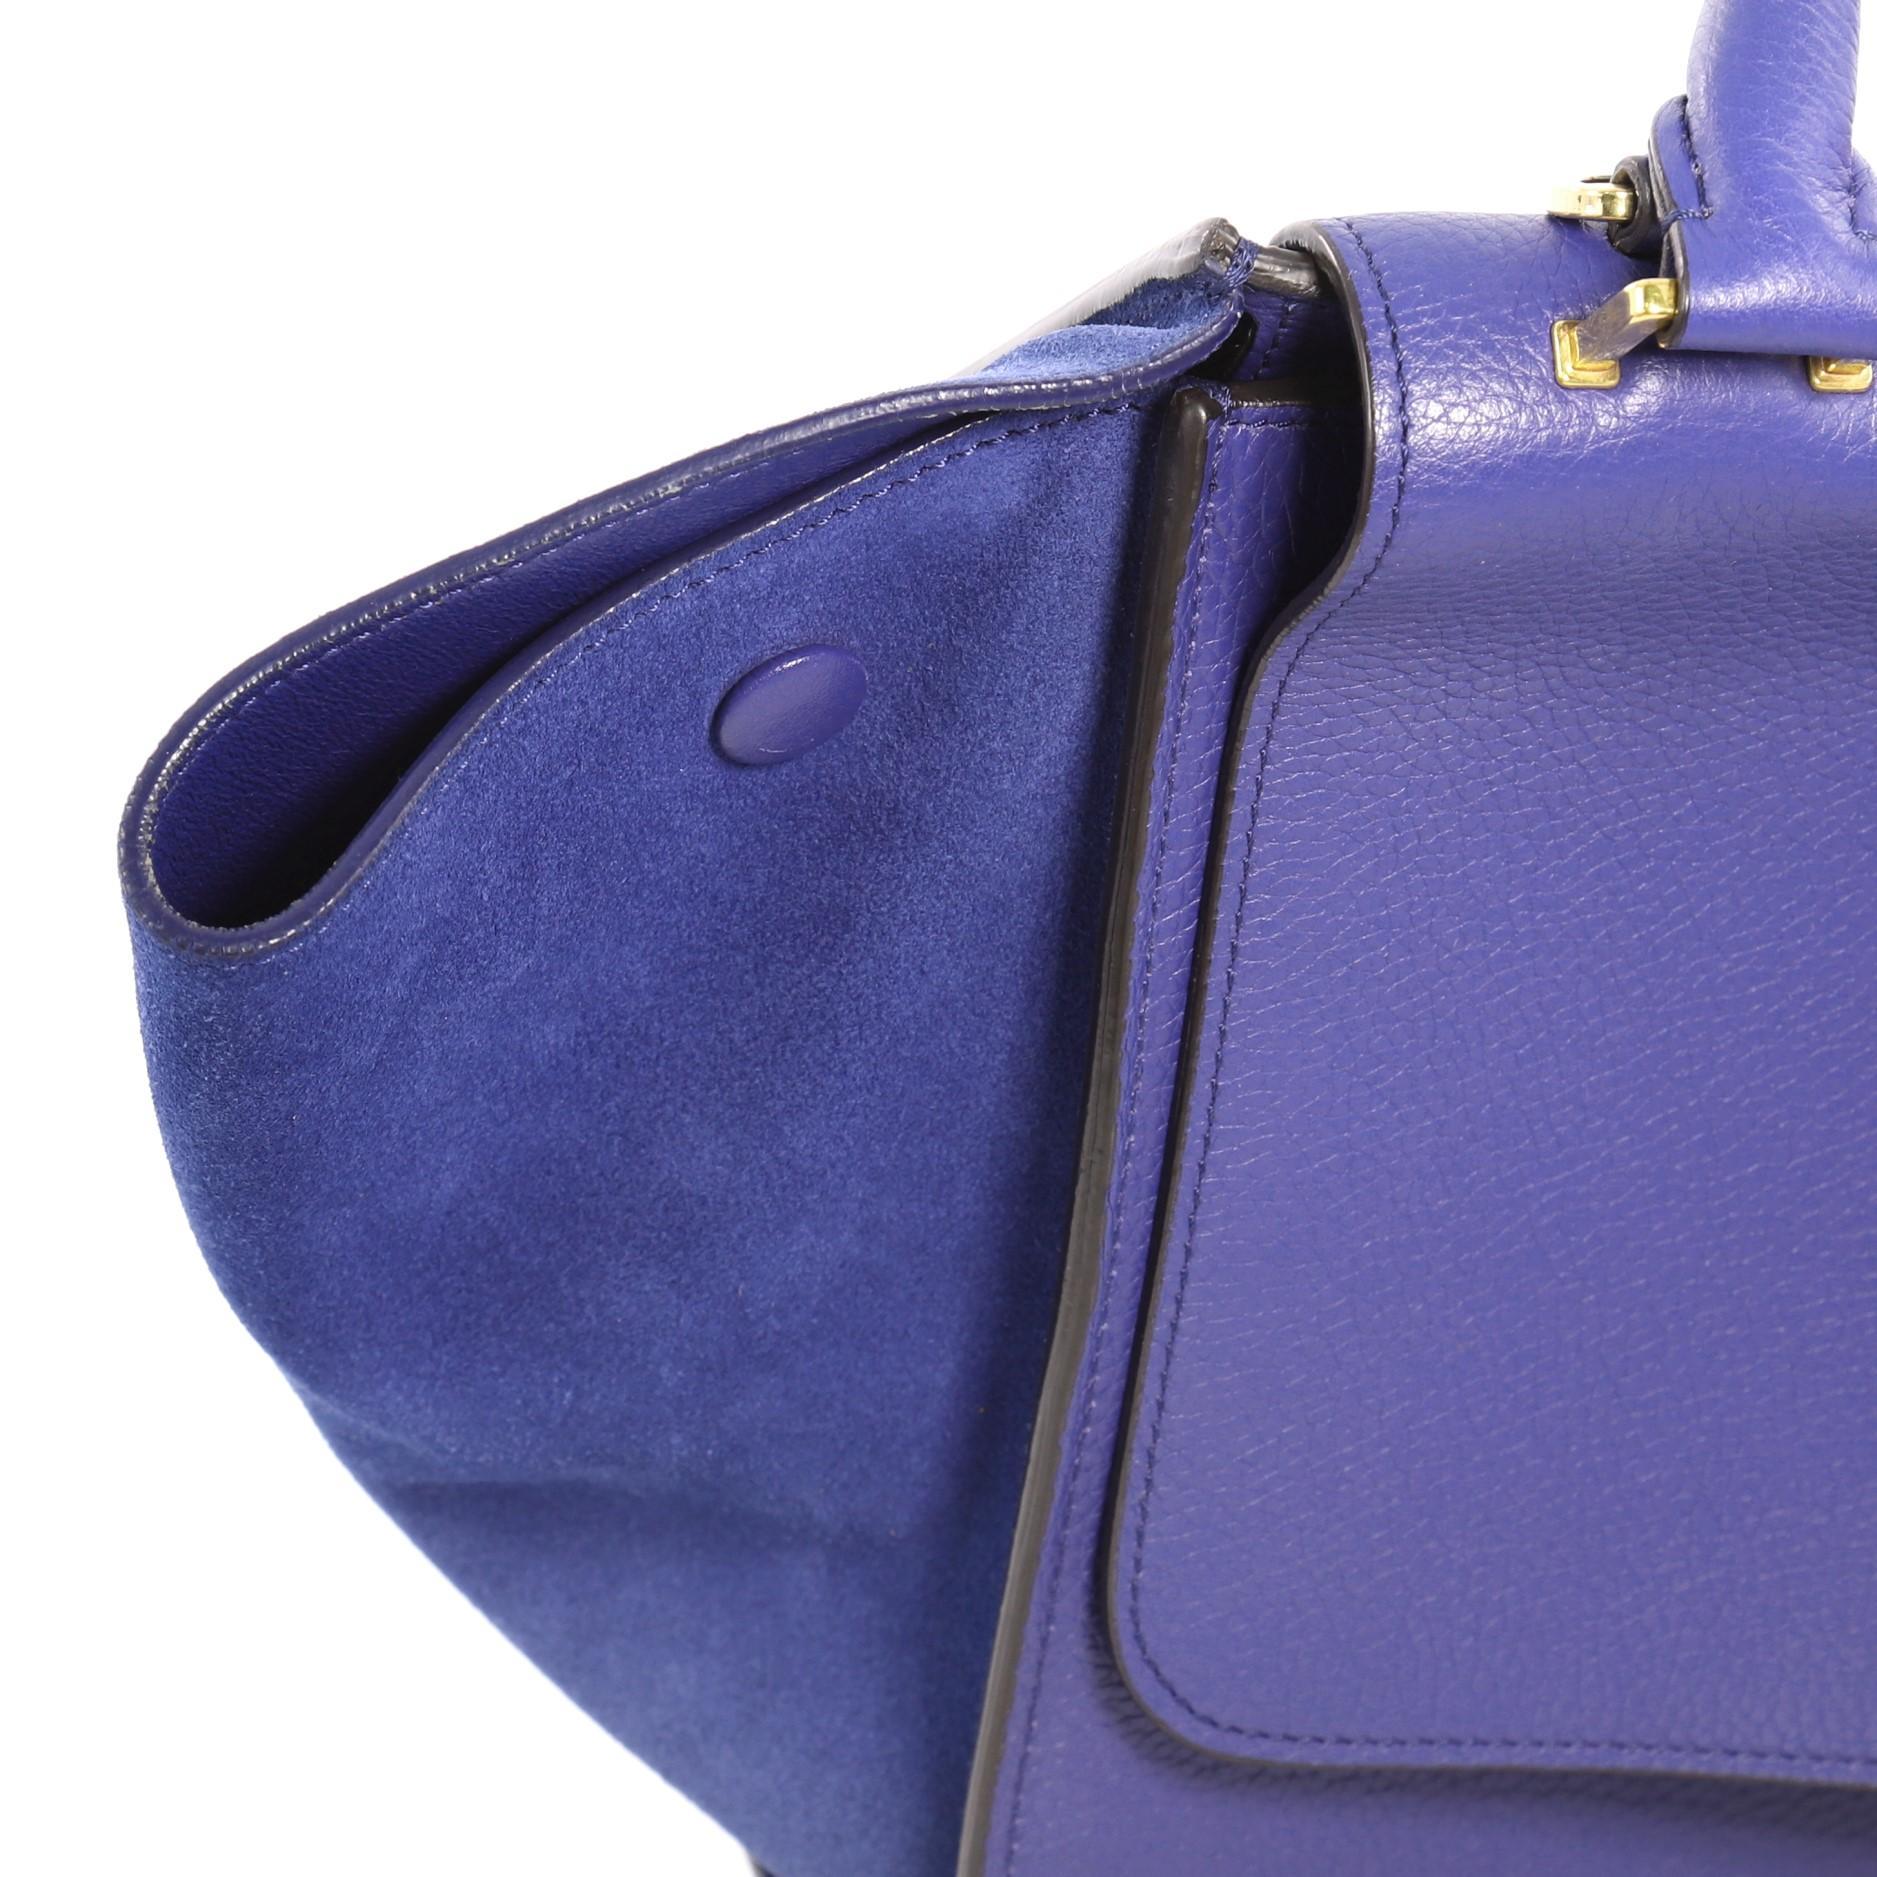 eb72989cf1a2 Celine Trapeze Handbag Leather Small at 1stdibs